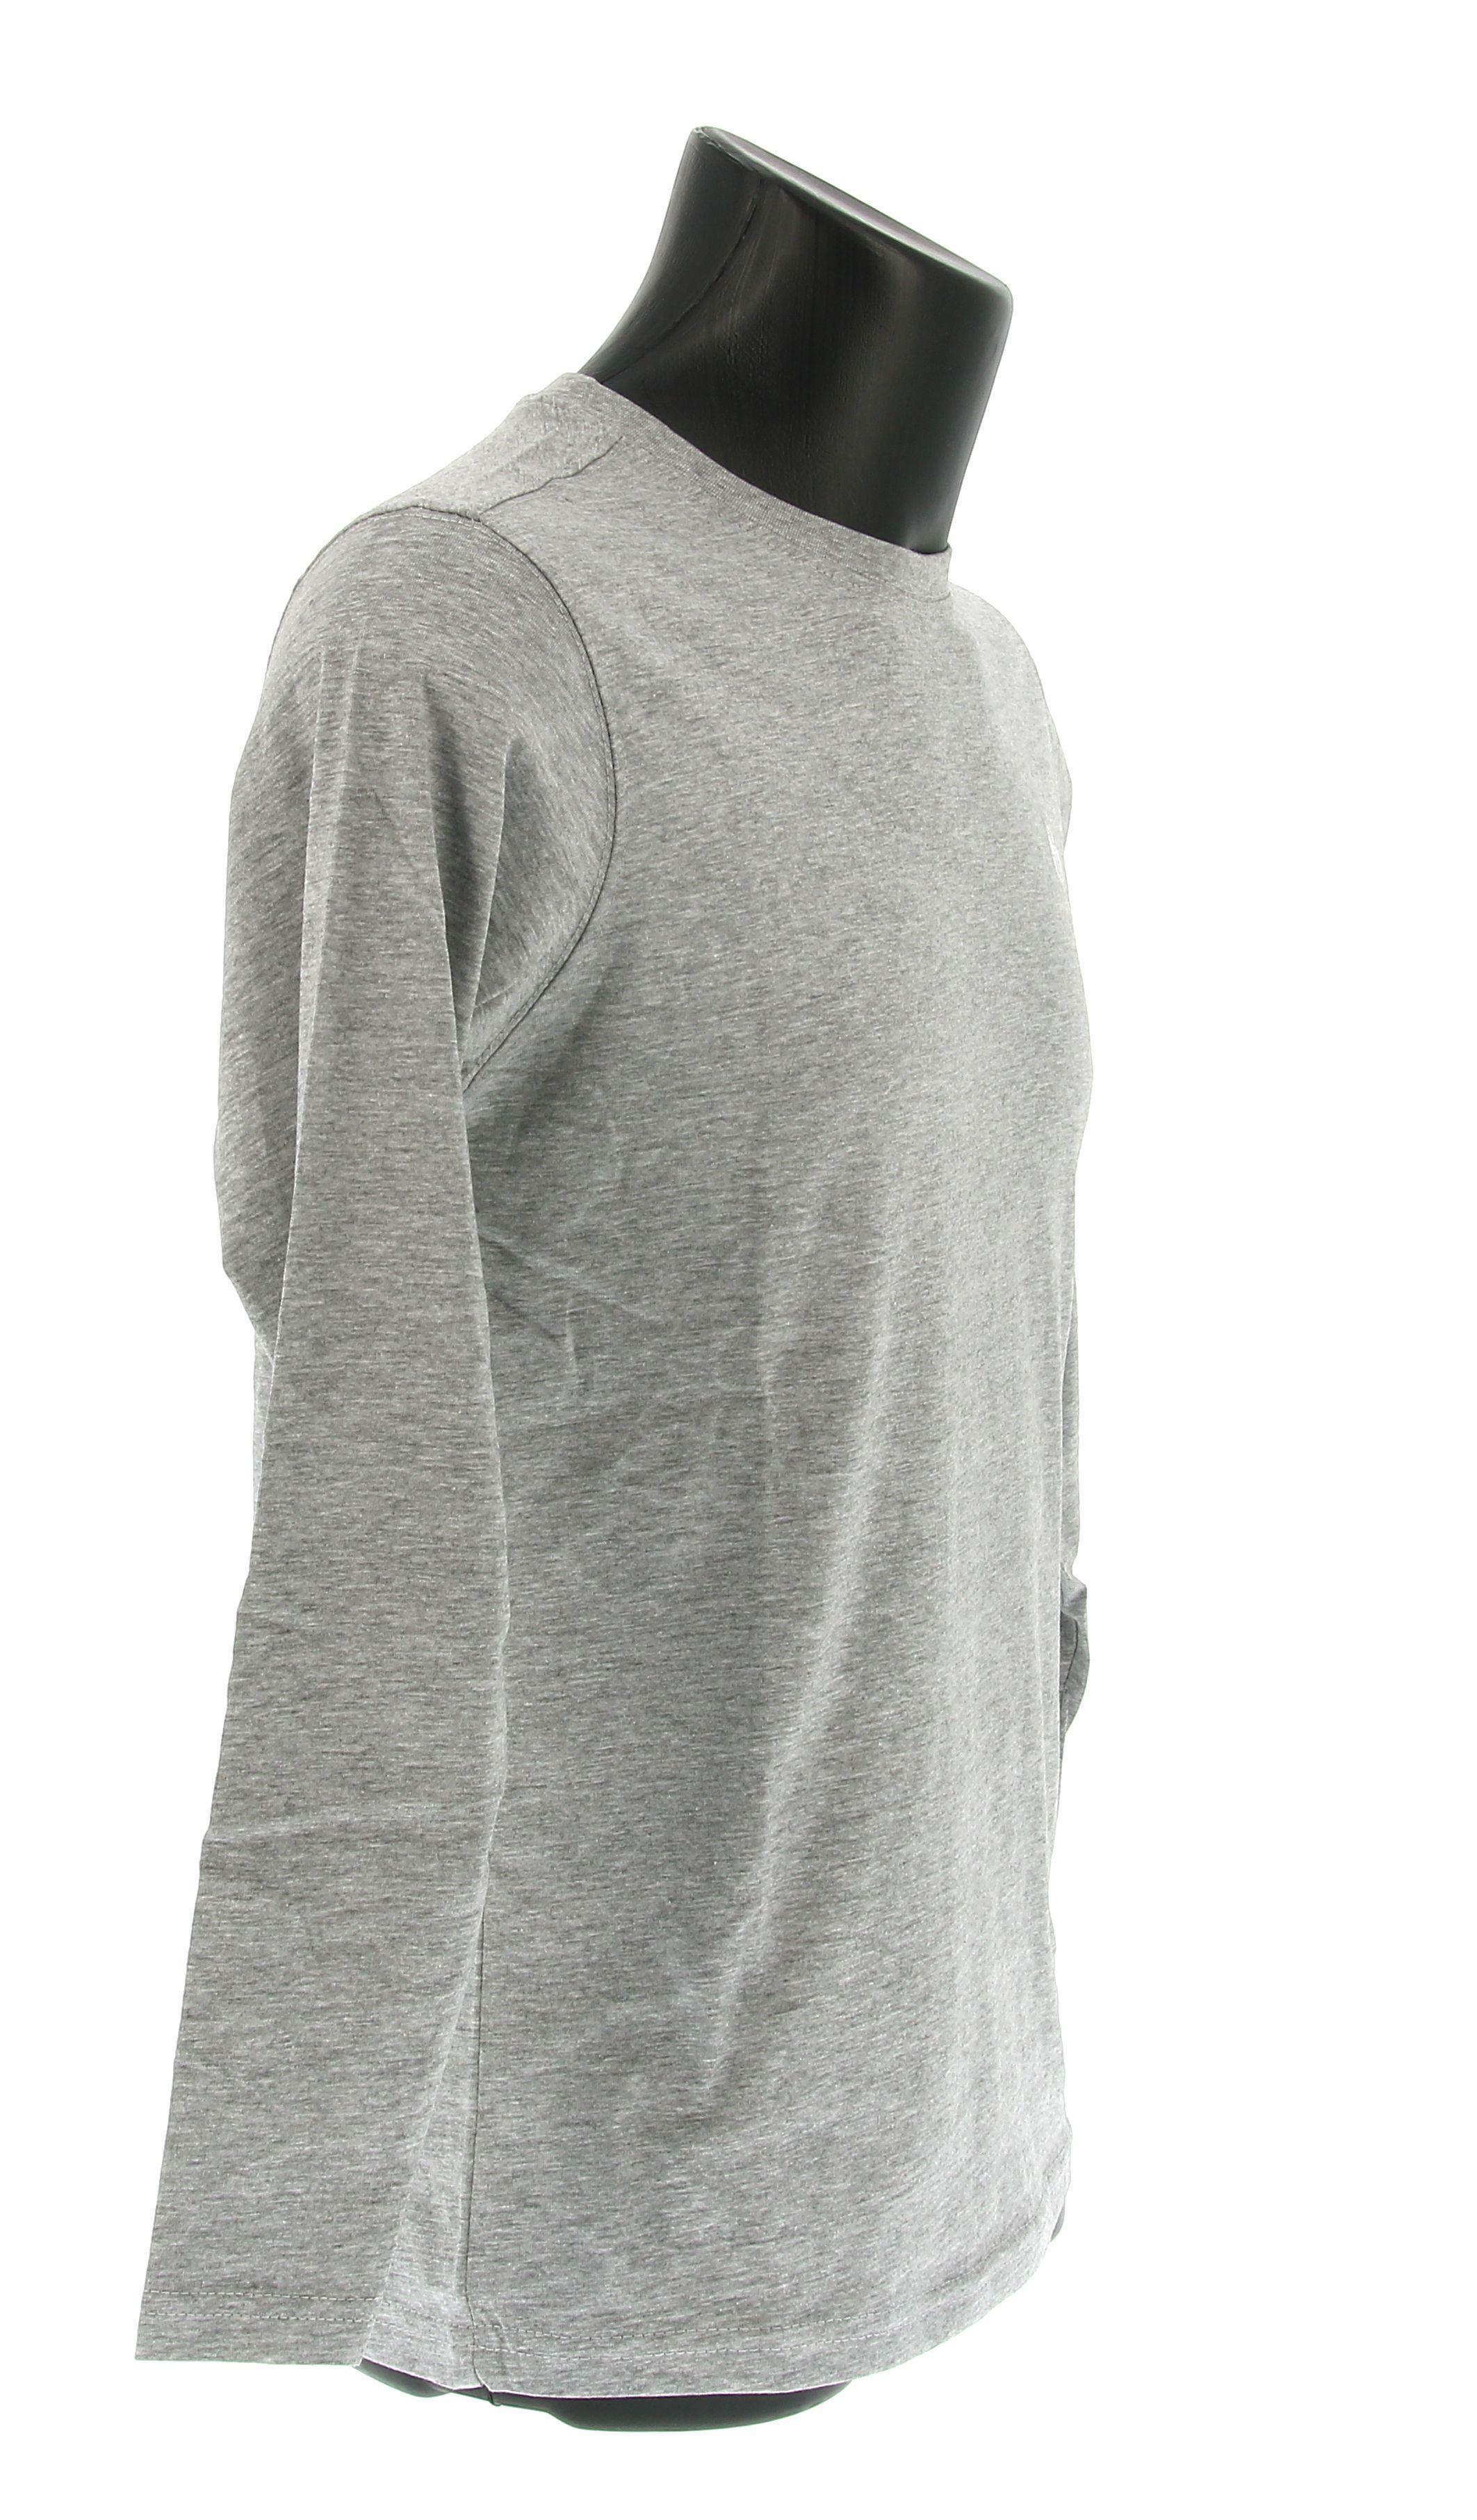 sergio tacchini sergio tacchini sl t-shirt iconic 10006 manica lunga uomo grigio